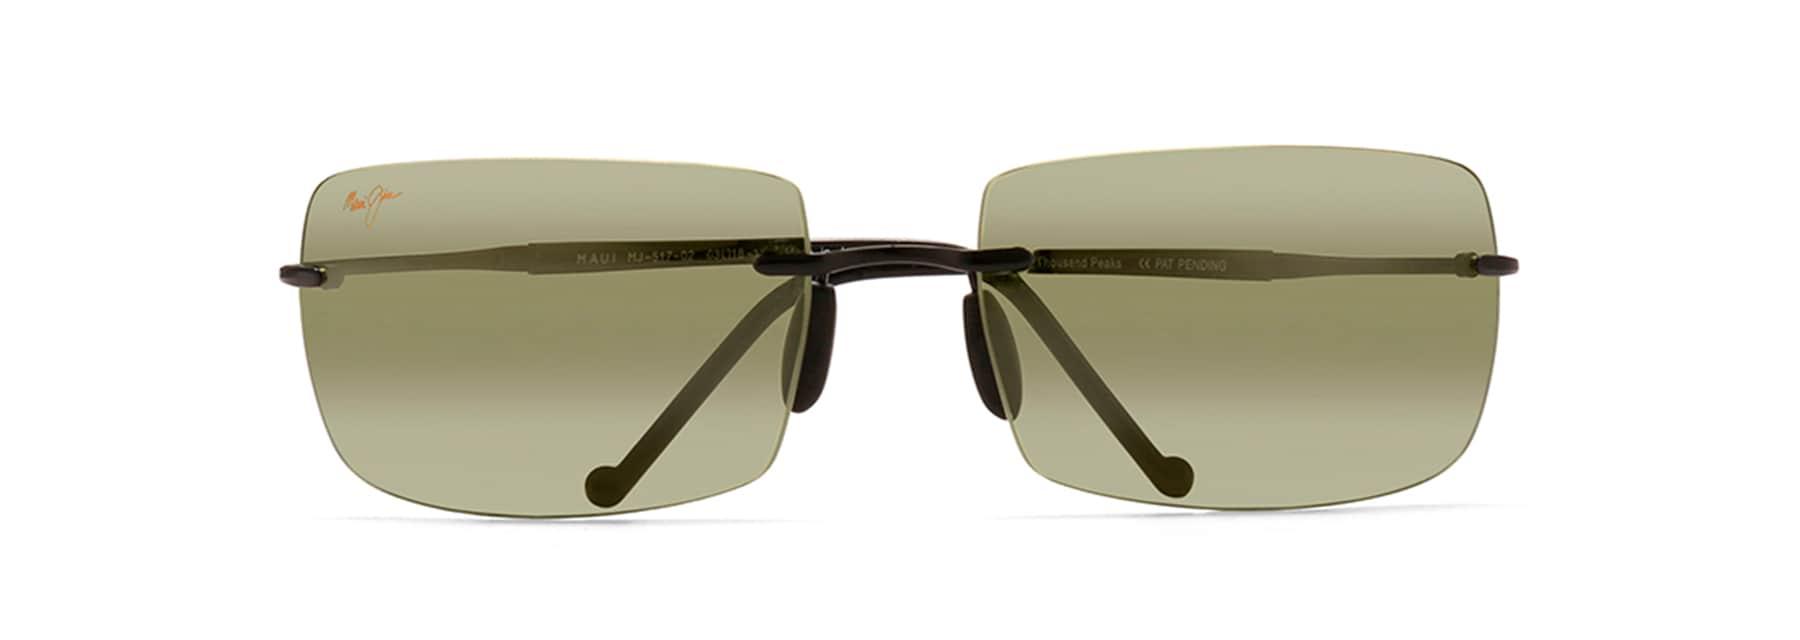 Thousand Peaks Polarized Sunglasses   Maui Jim®